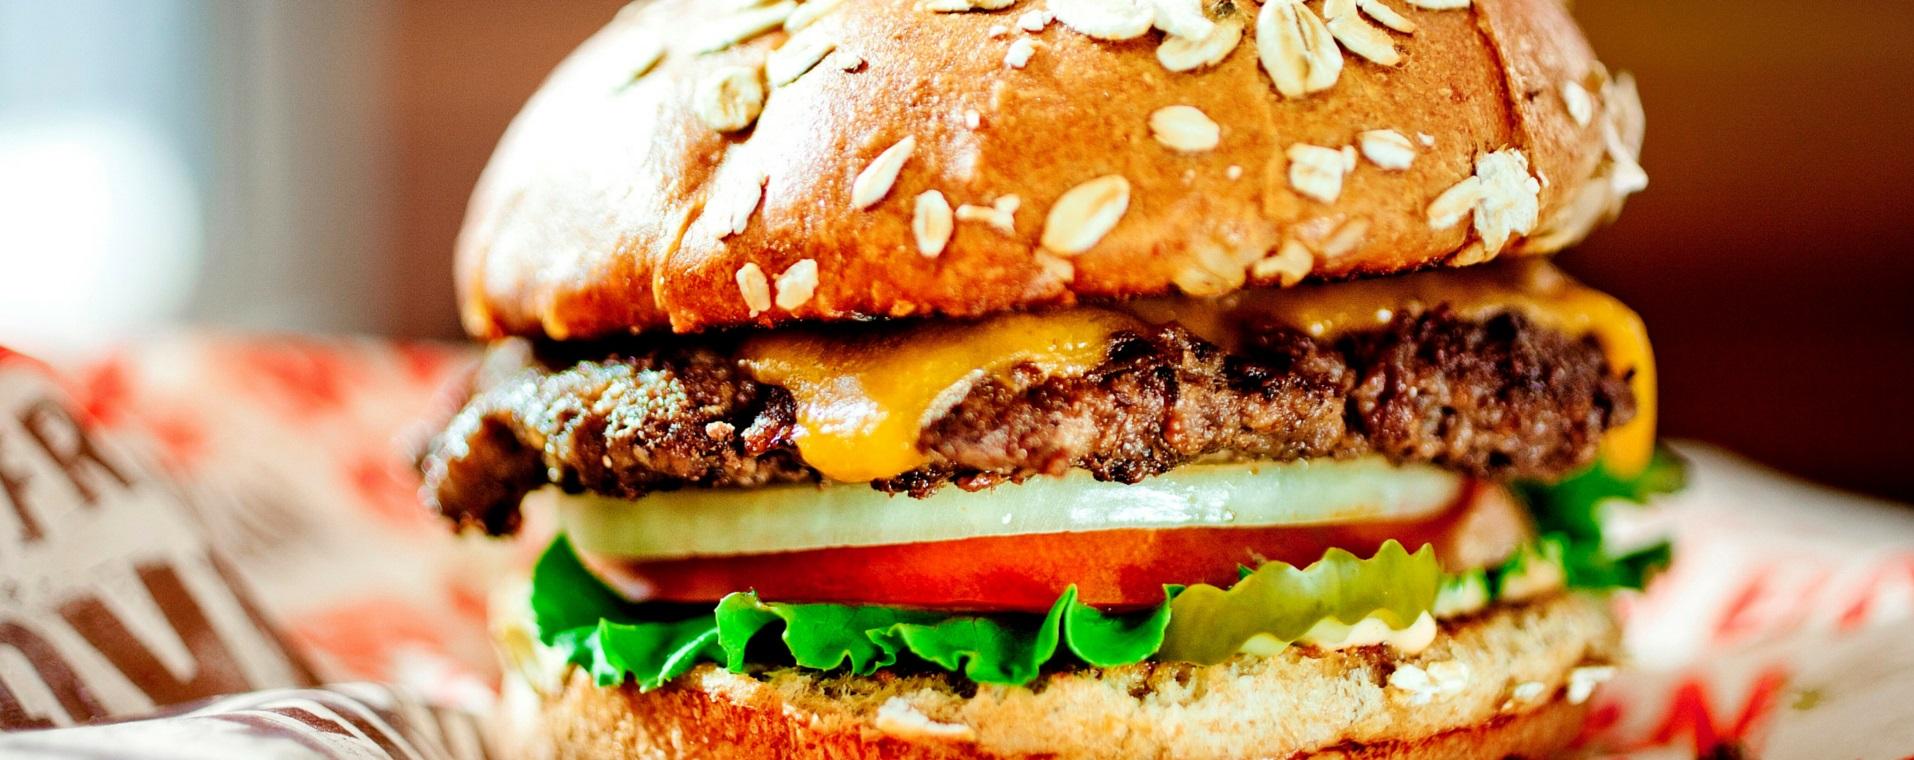 Epic burger